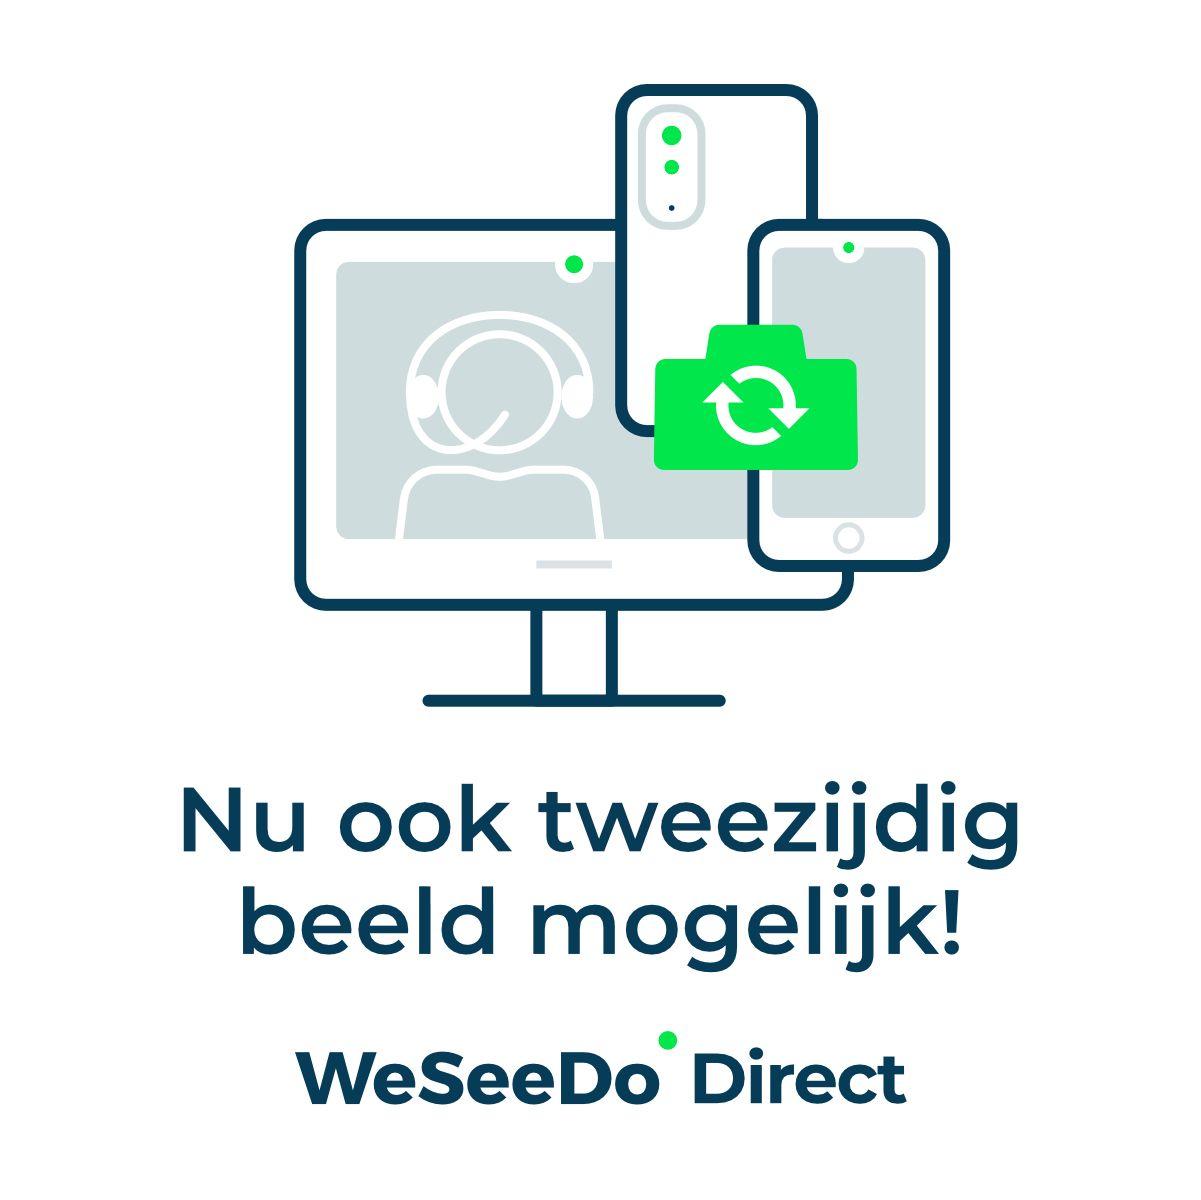 Social images WeSeeDo Direct Tweezijdig Social